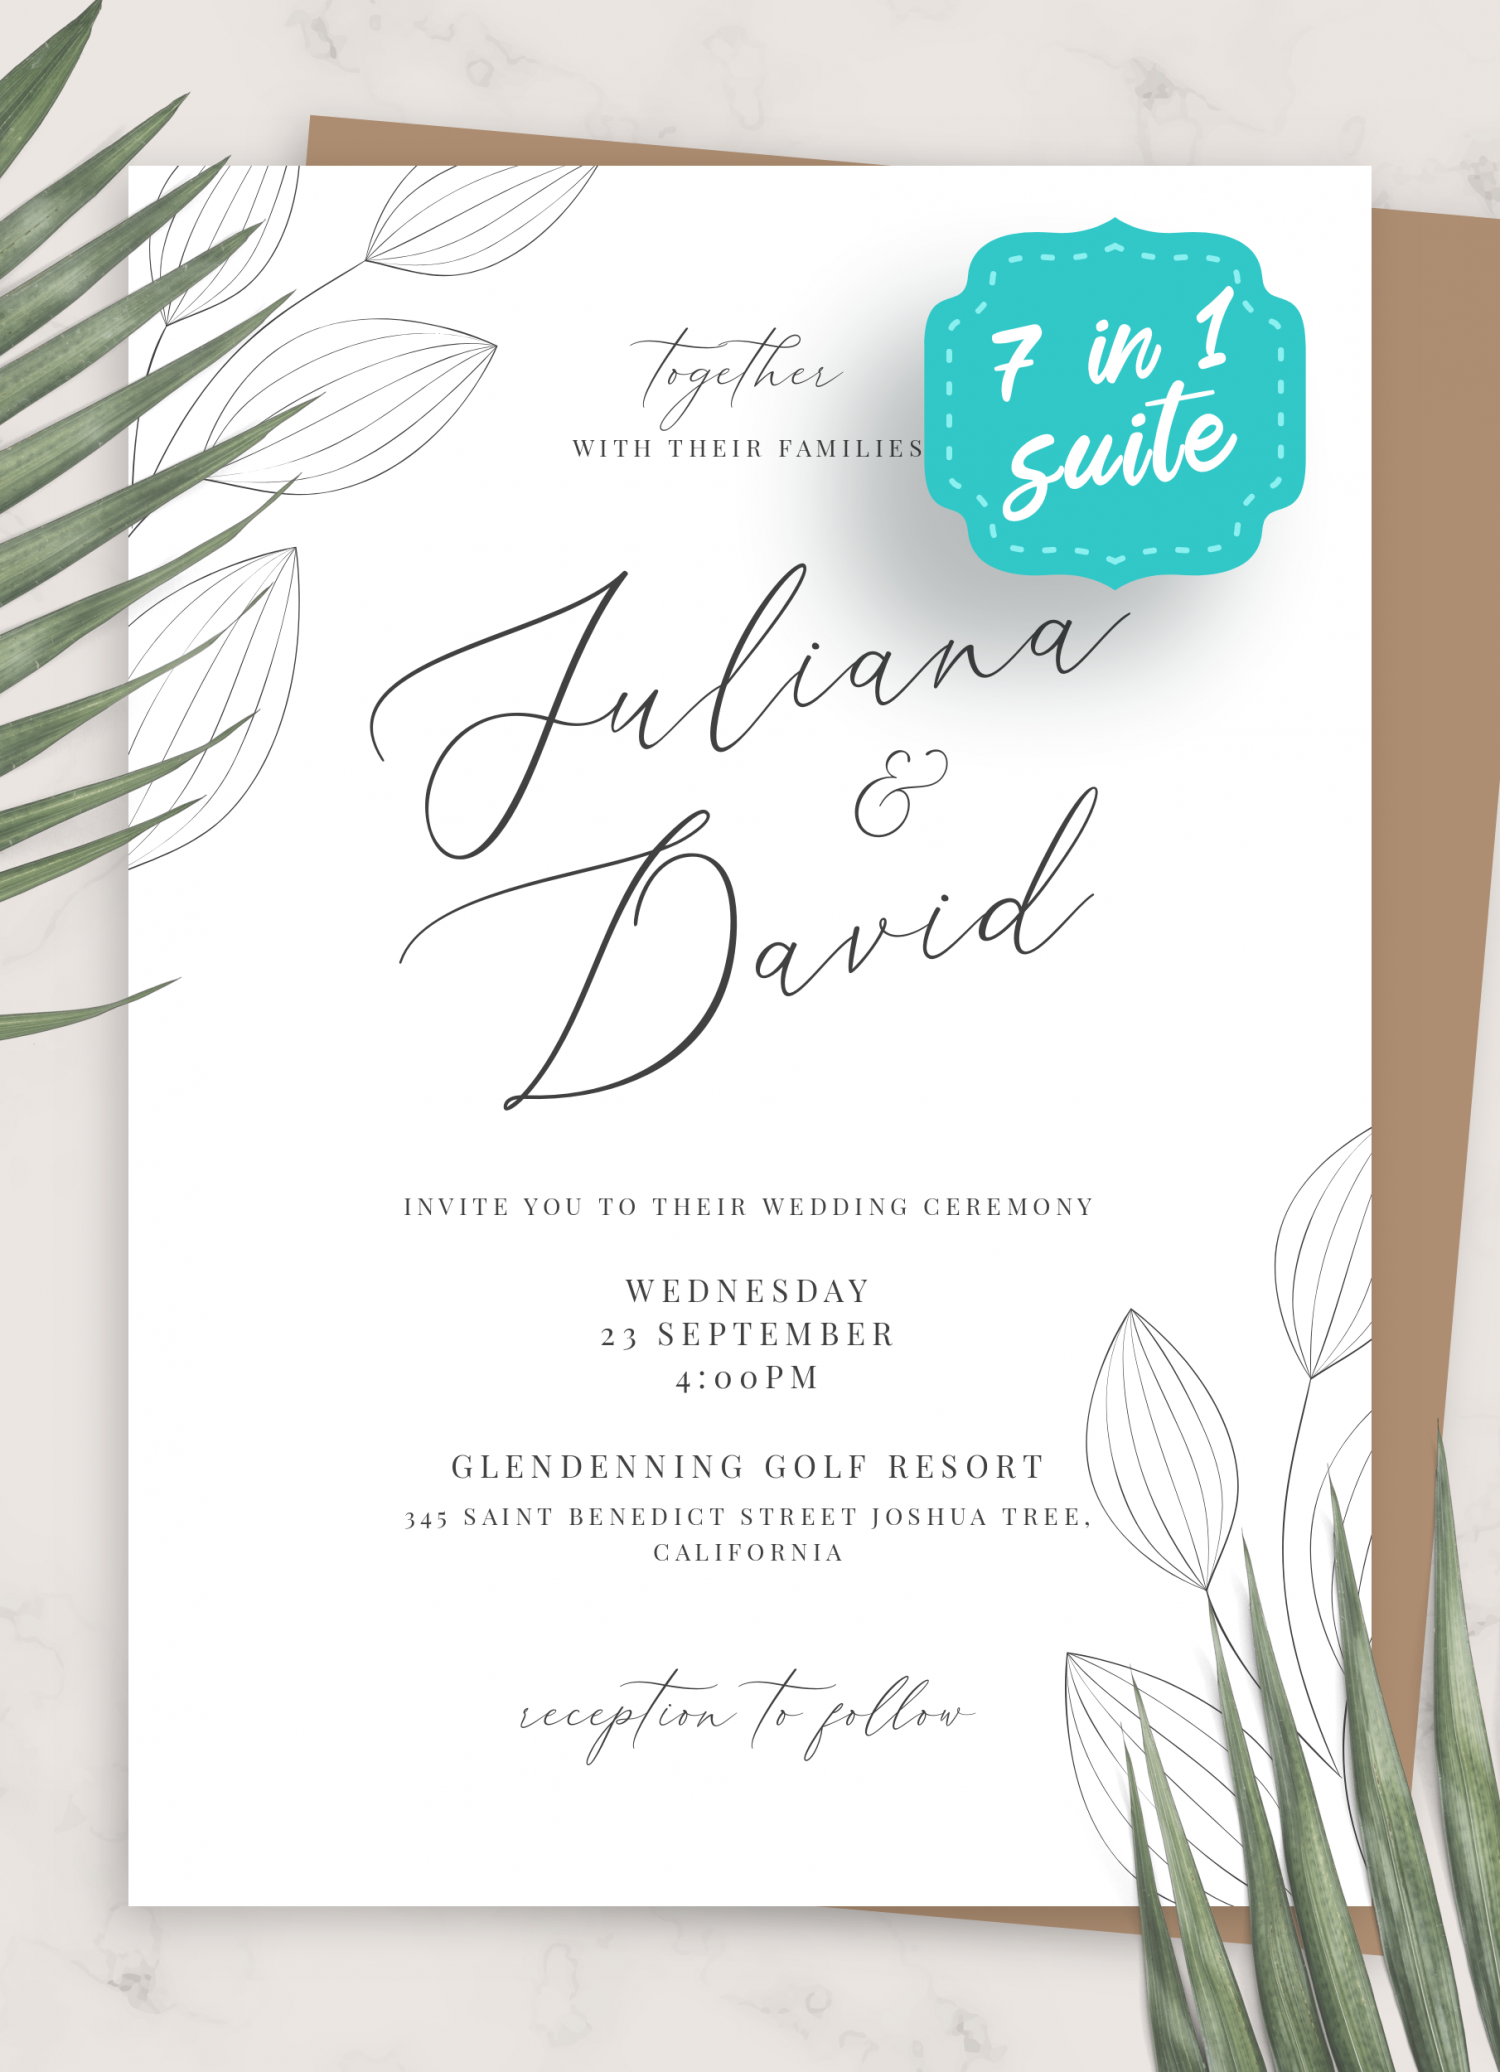 Details Card Wedding Invites Wedding Set Wedding Invitation Suite RSVP Card Wedding Invitation Template Download Printable Minimalist